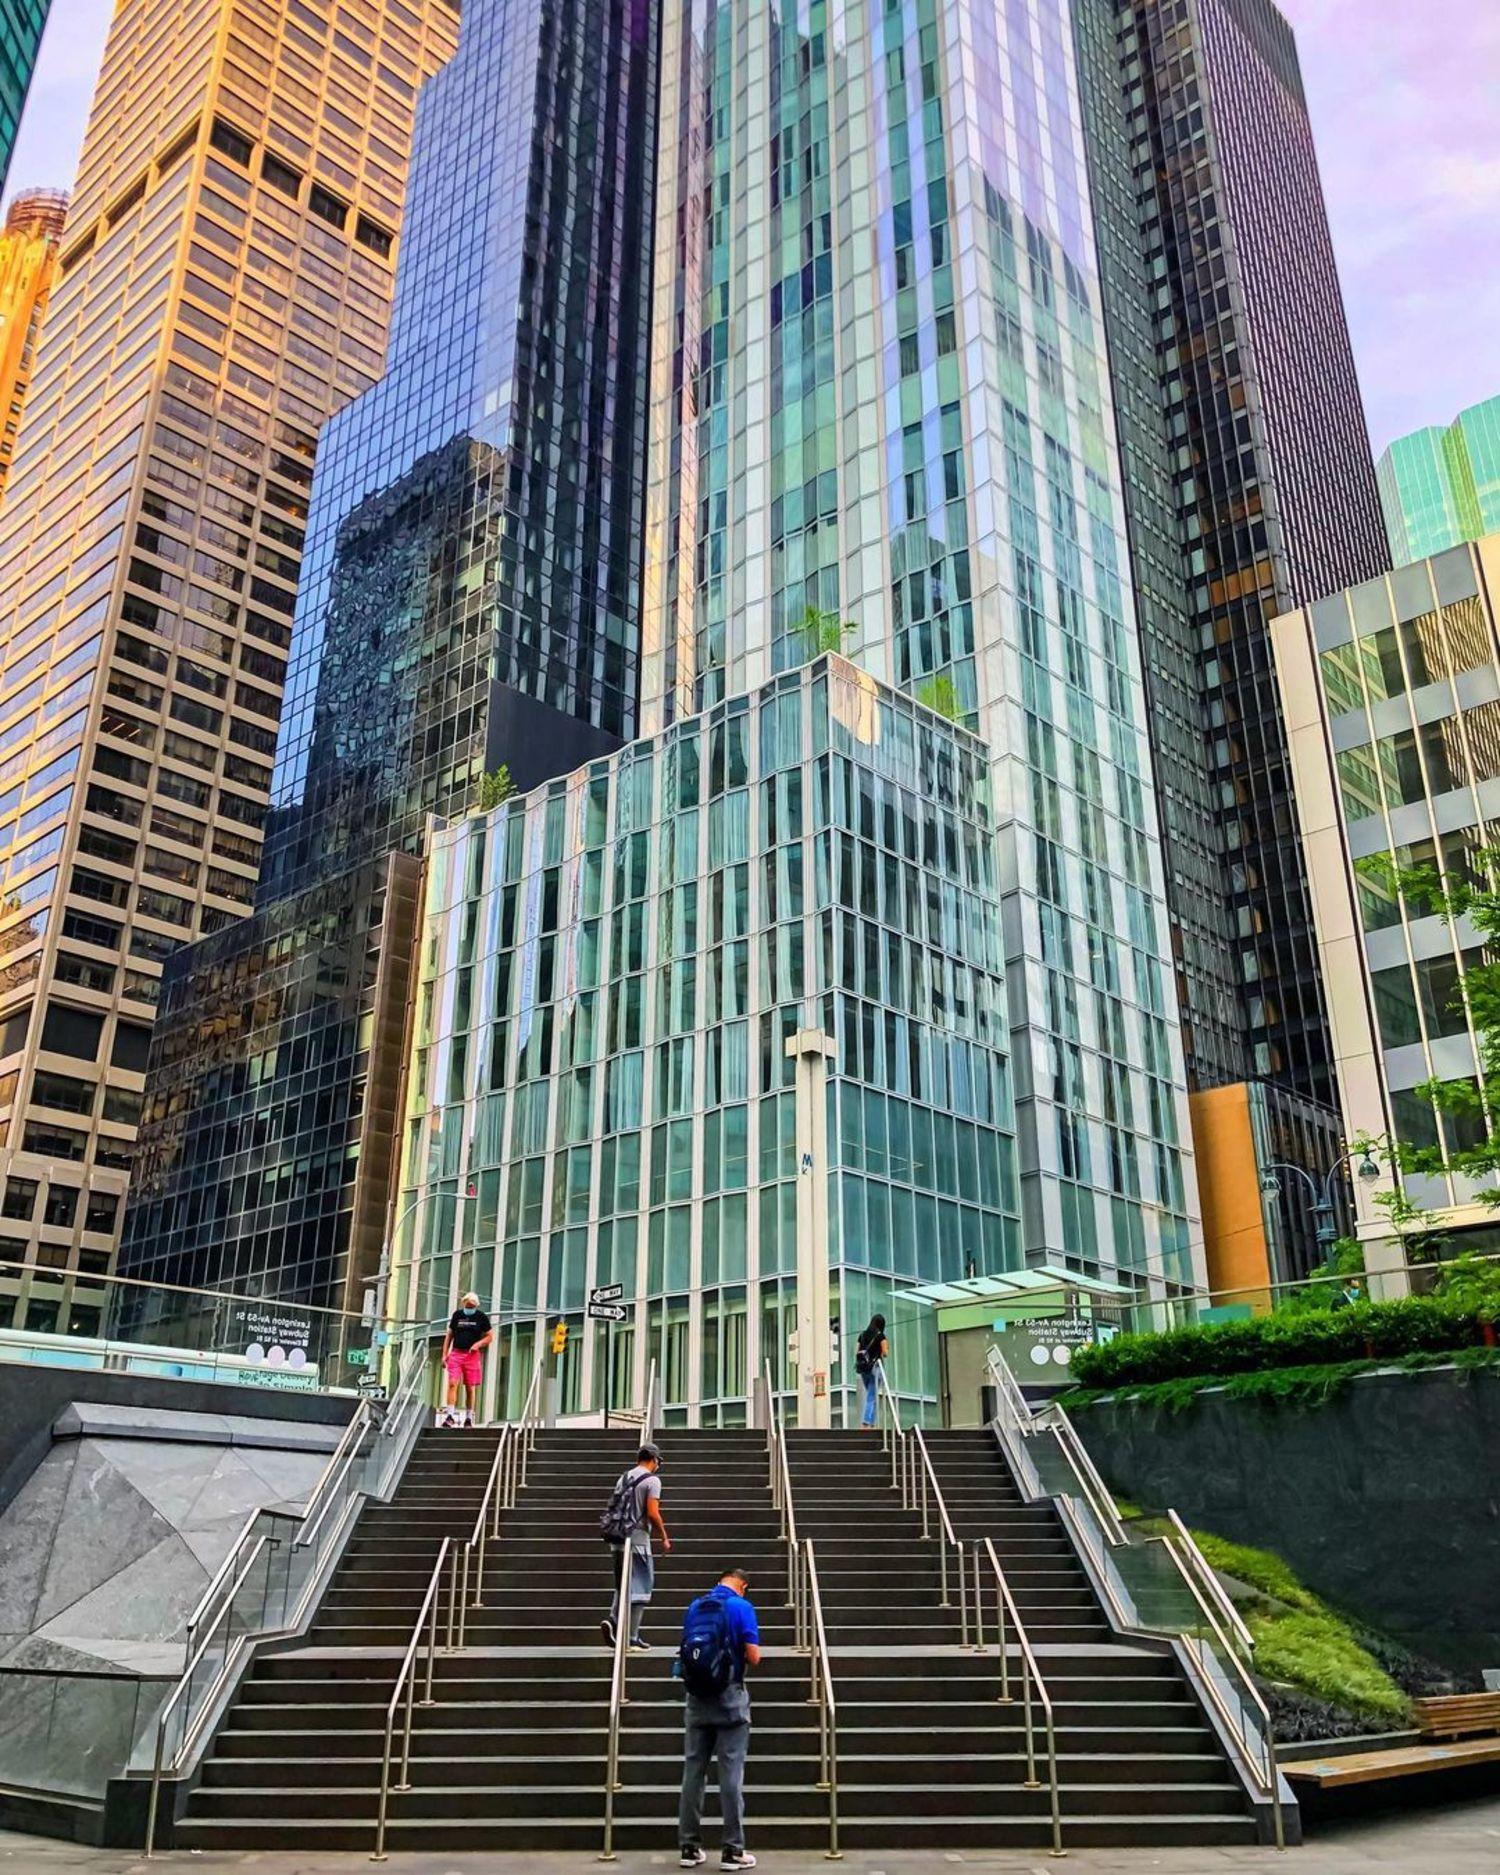 53rd Street and Lexington Avenue, Midtown East, Manhattan